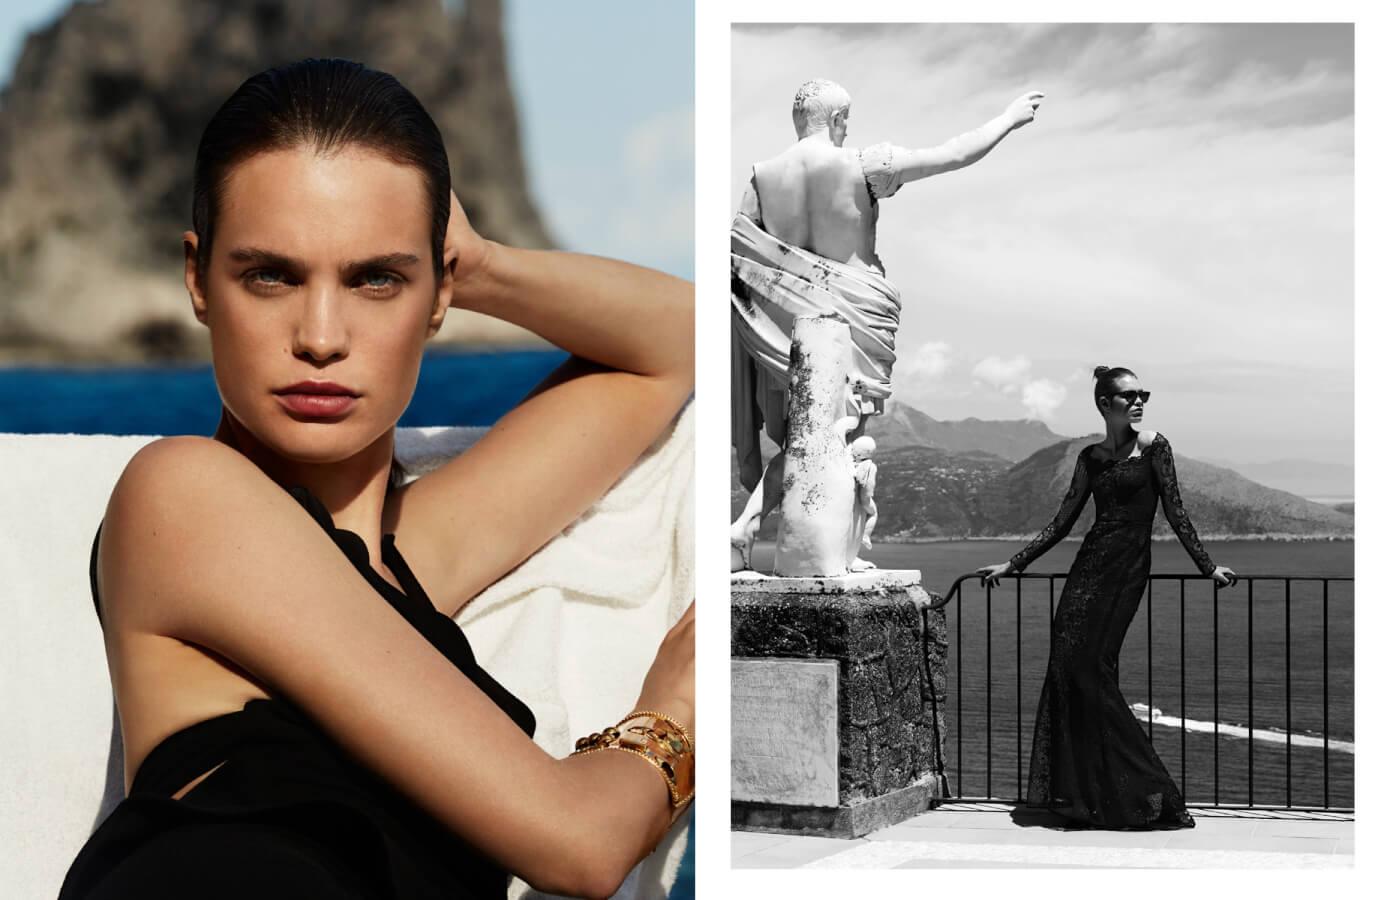 02_Alvaro_Beamud_Cortes_Air_France_Madame_Capri